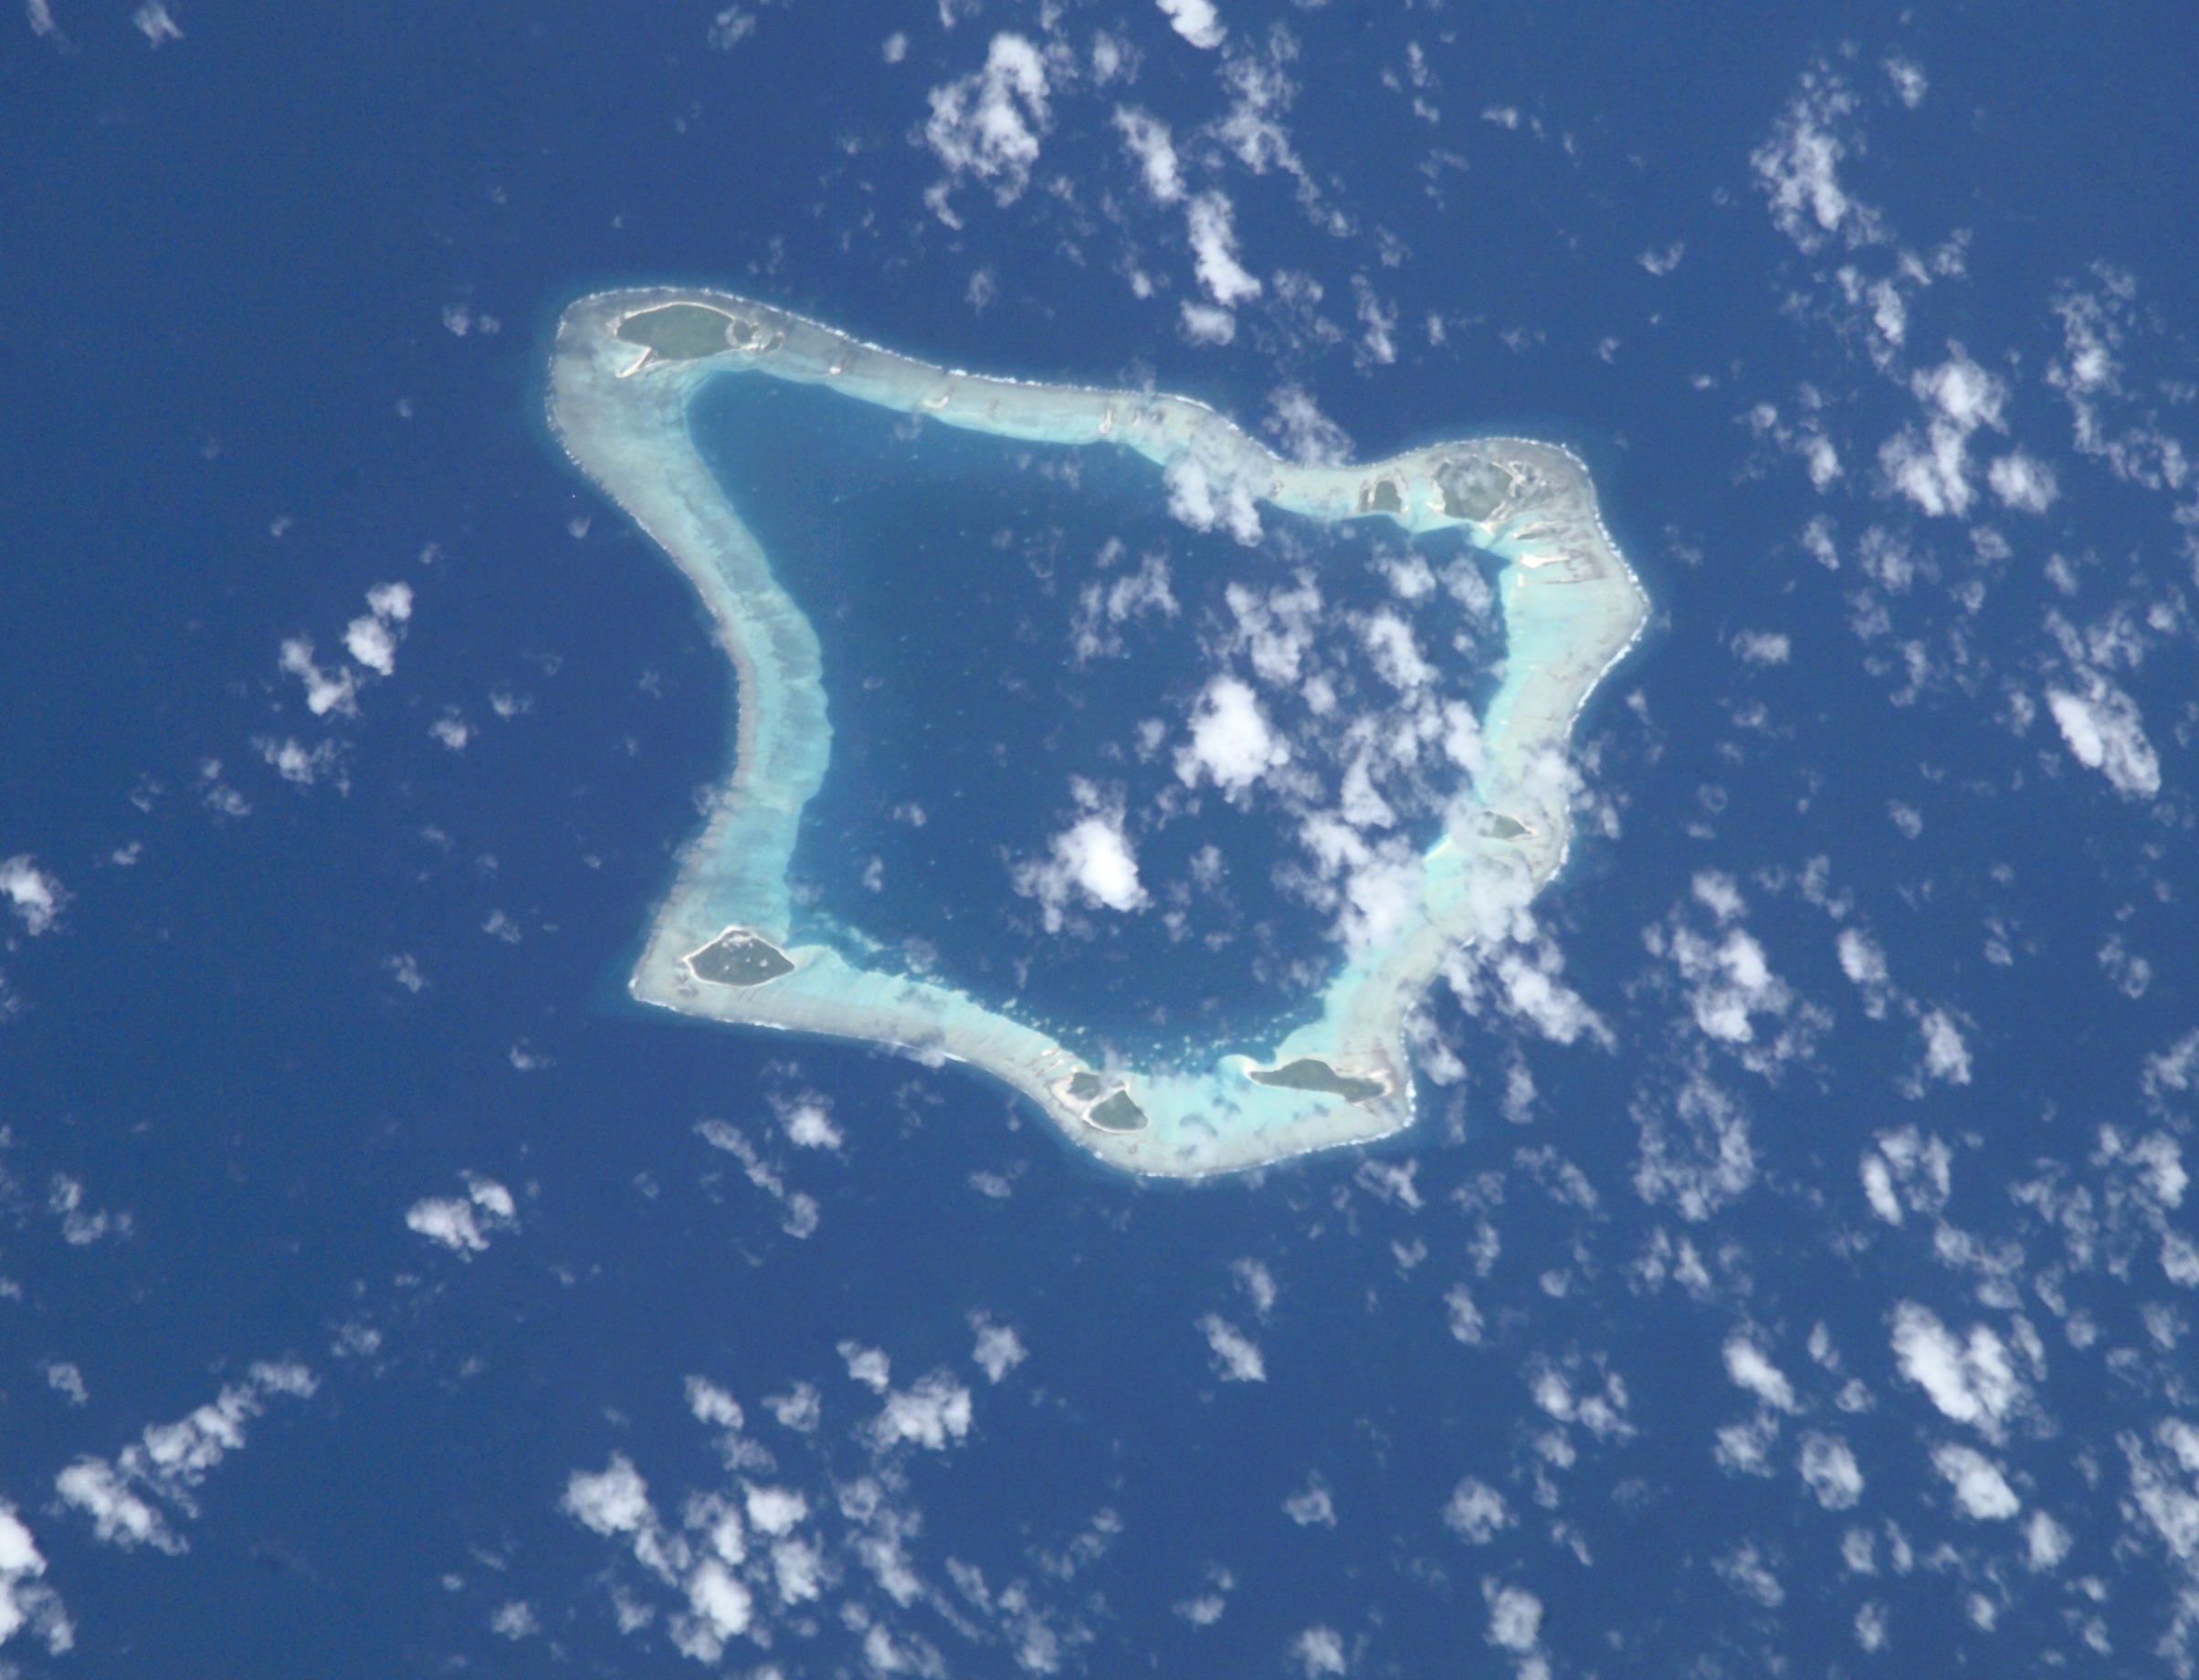 File:Palmerston Atoll.jpg - Wikipedia, the free encyclopedia: en.wikipedia.org/wiki/file:palmerston_atoll.jpg